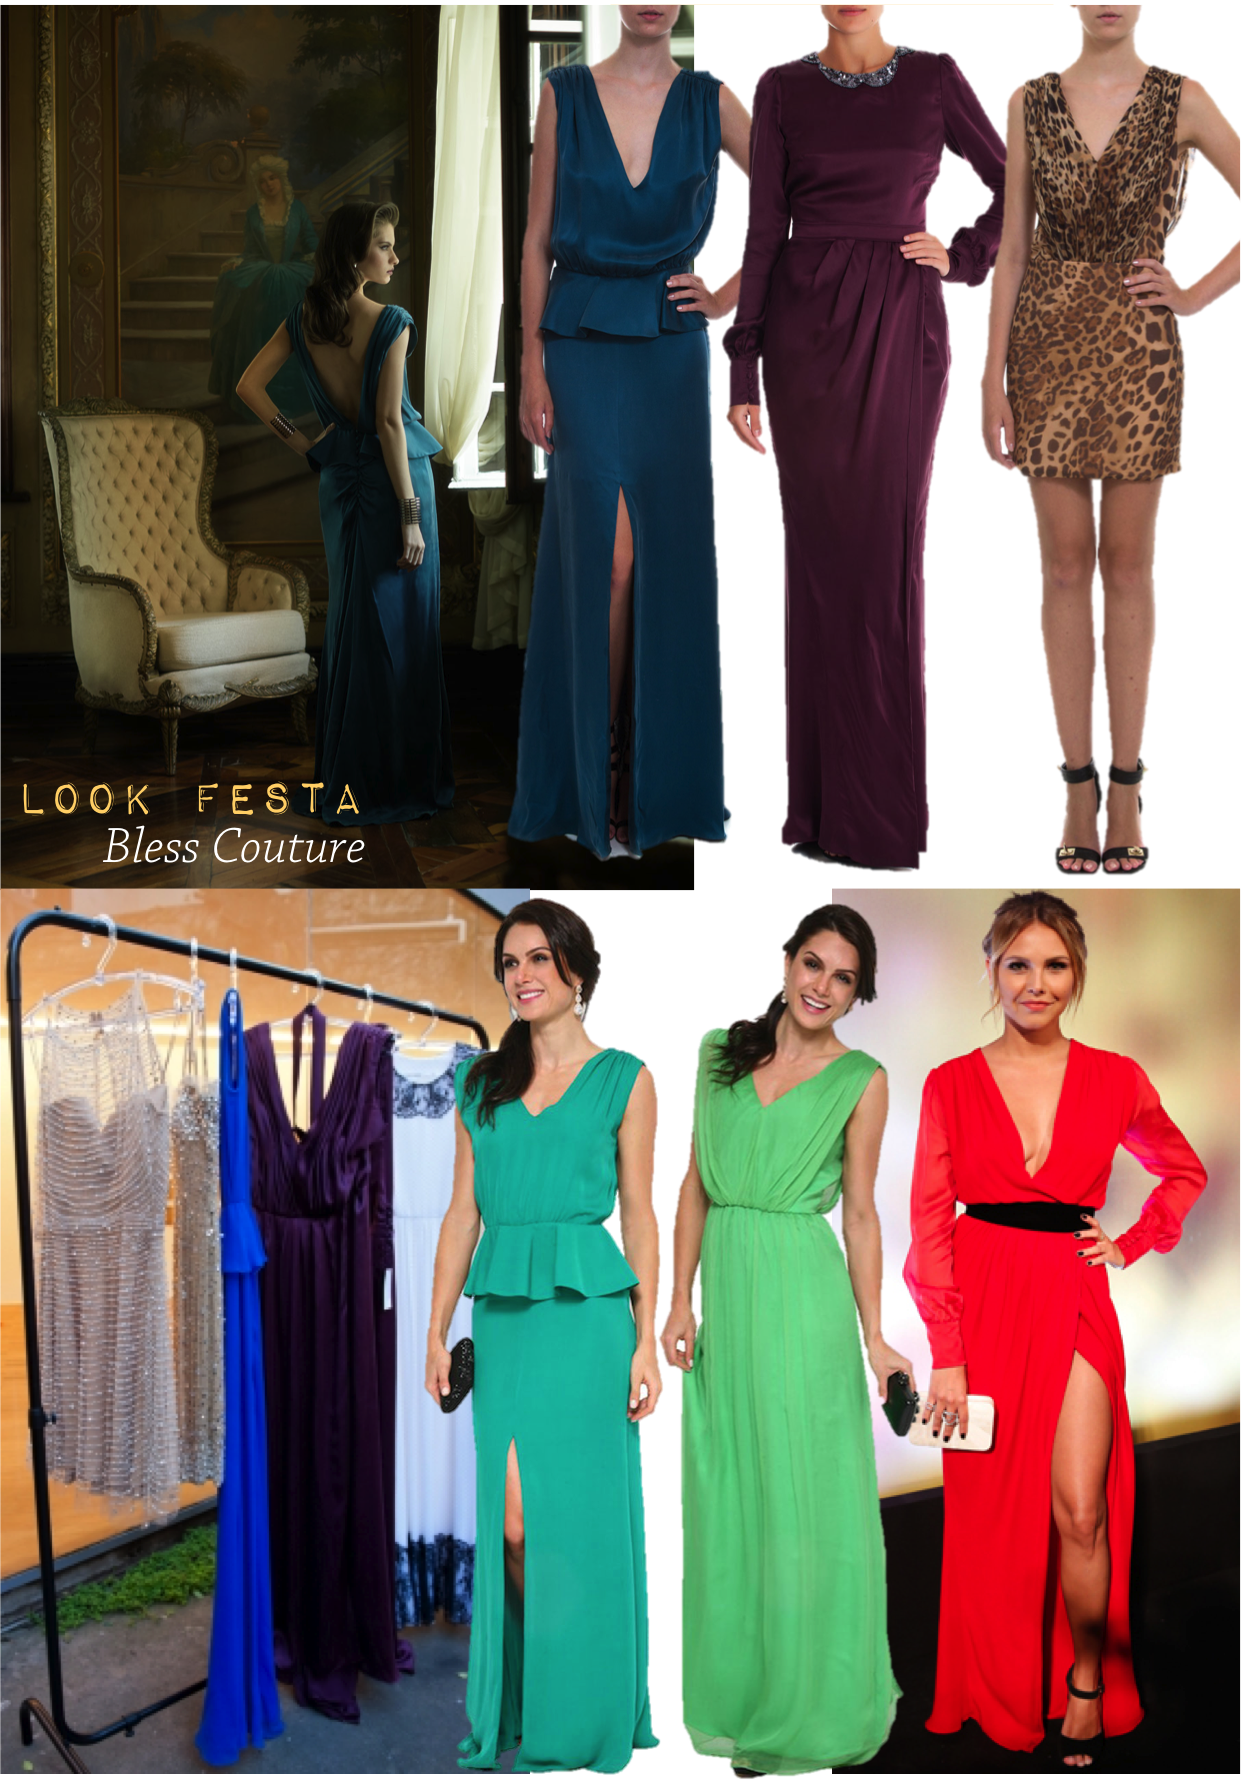 bless-couture-vestid-festa-comprar